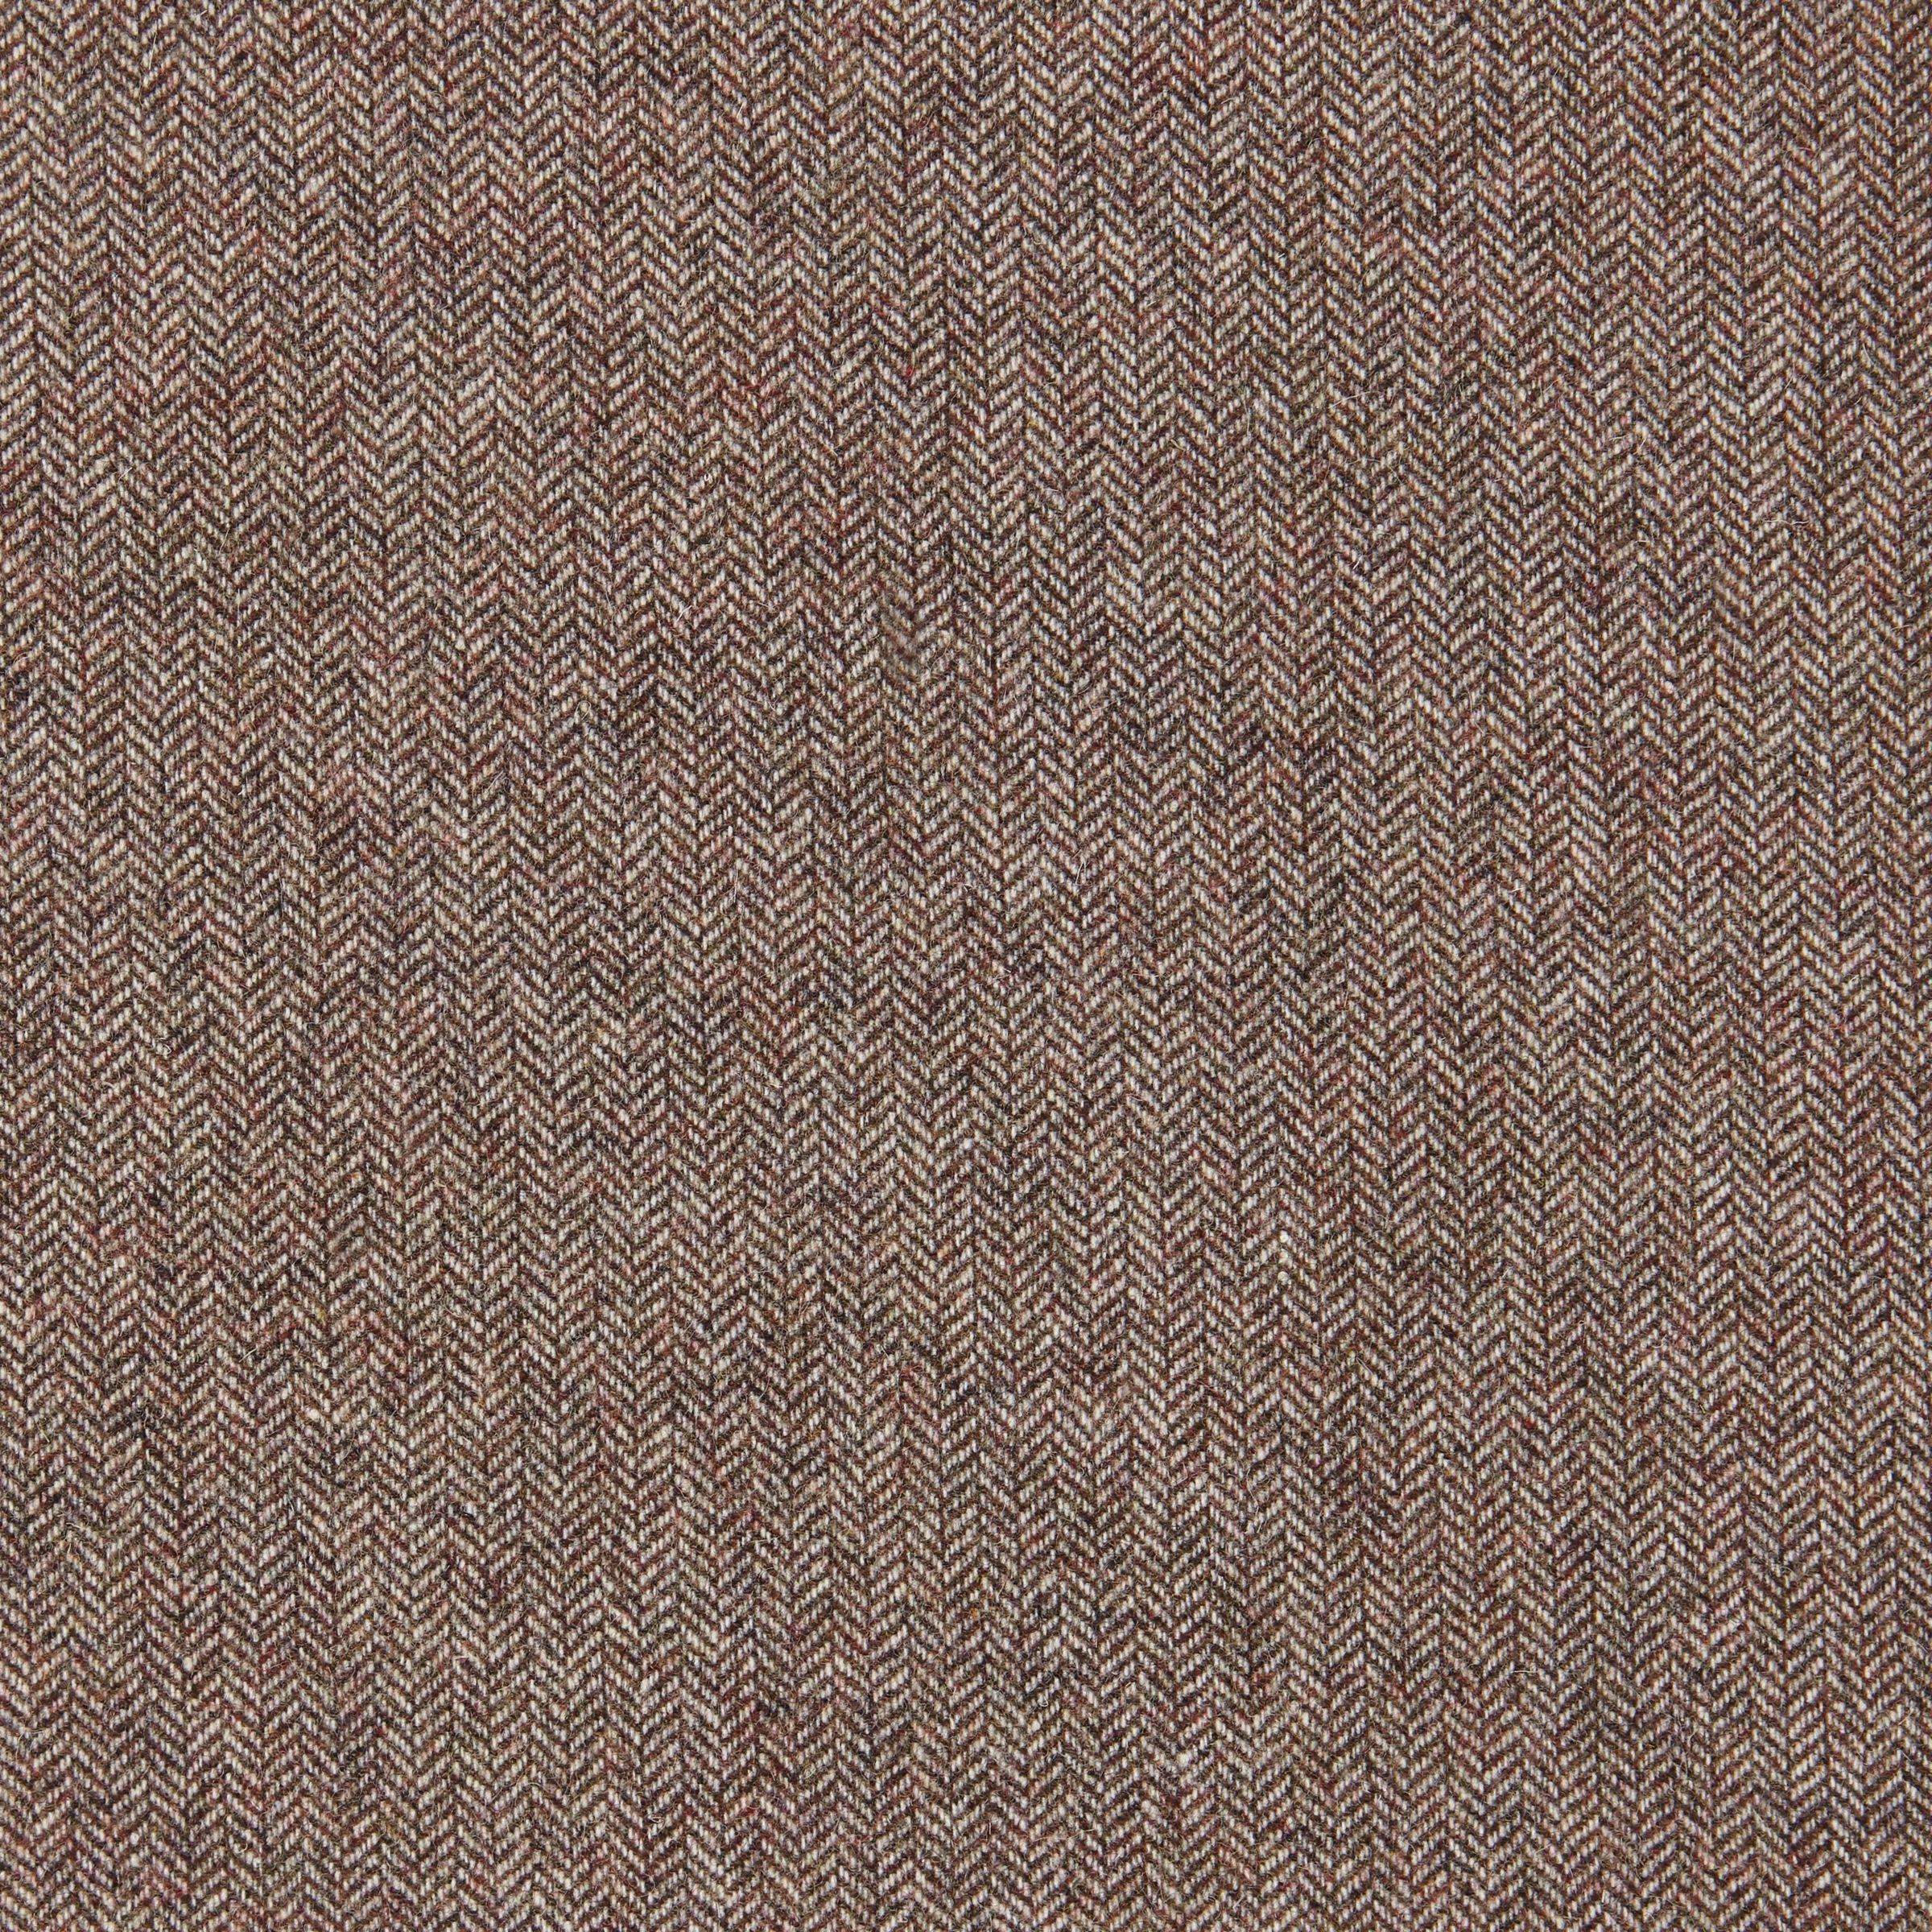 01a5d998943d Viscount Textiles Wool Suiting Herringbone Print Fabric